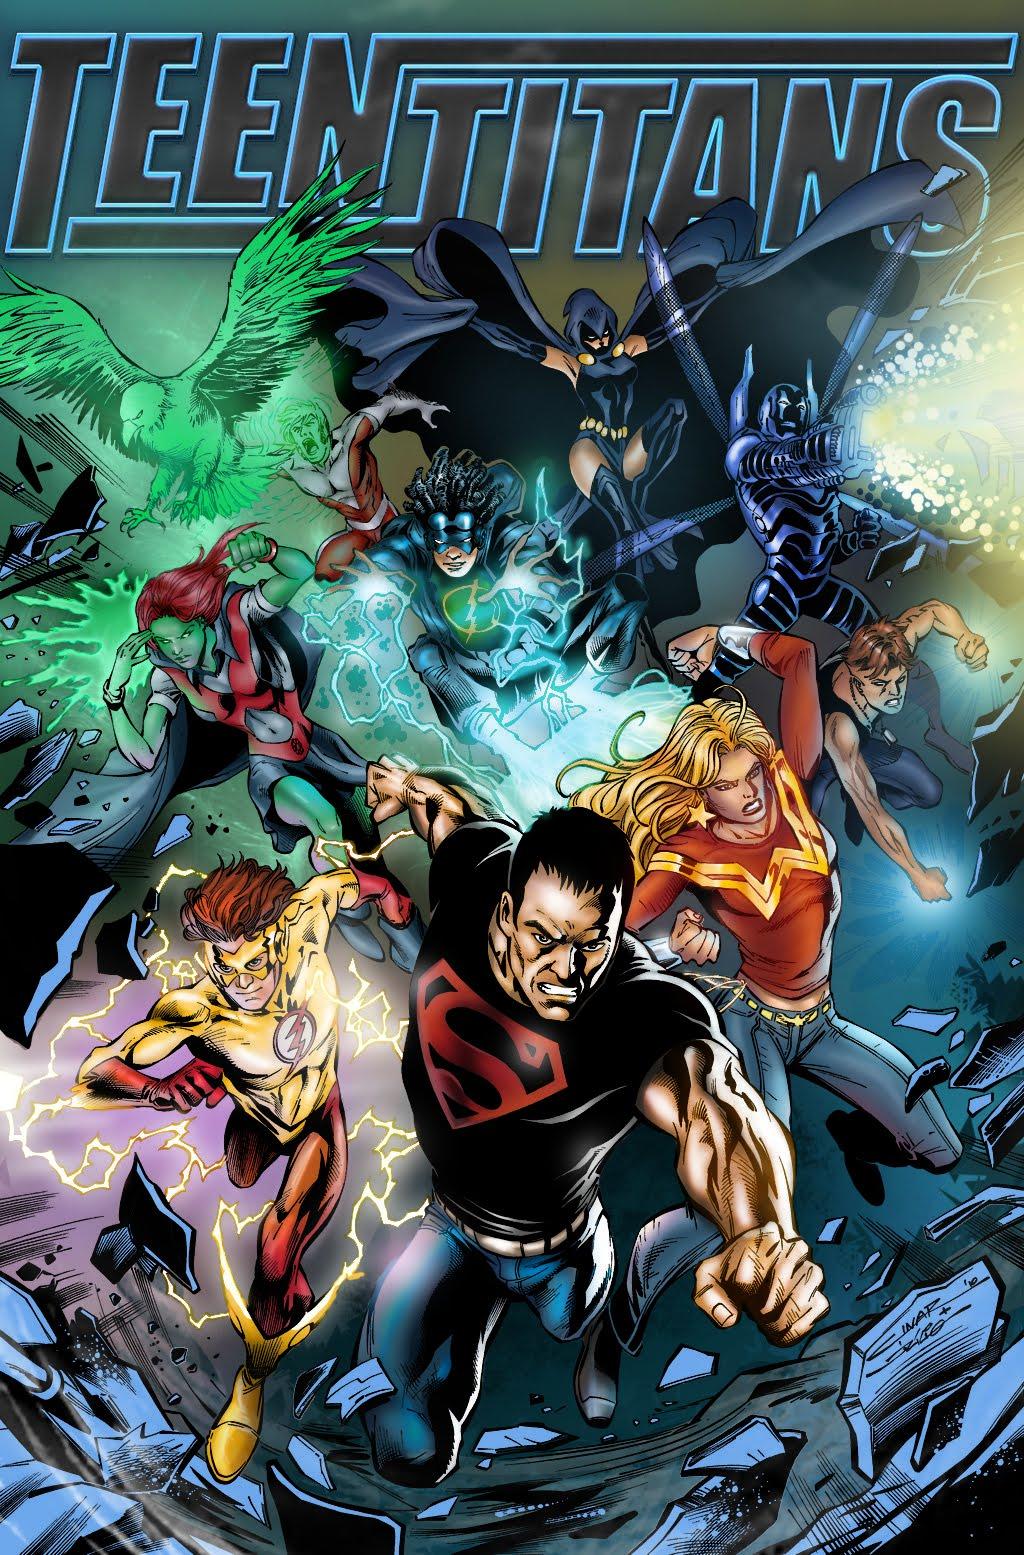 Teen Titans Cover Col Smek Teen Titans 56 Wallpaper